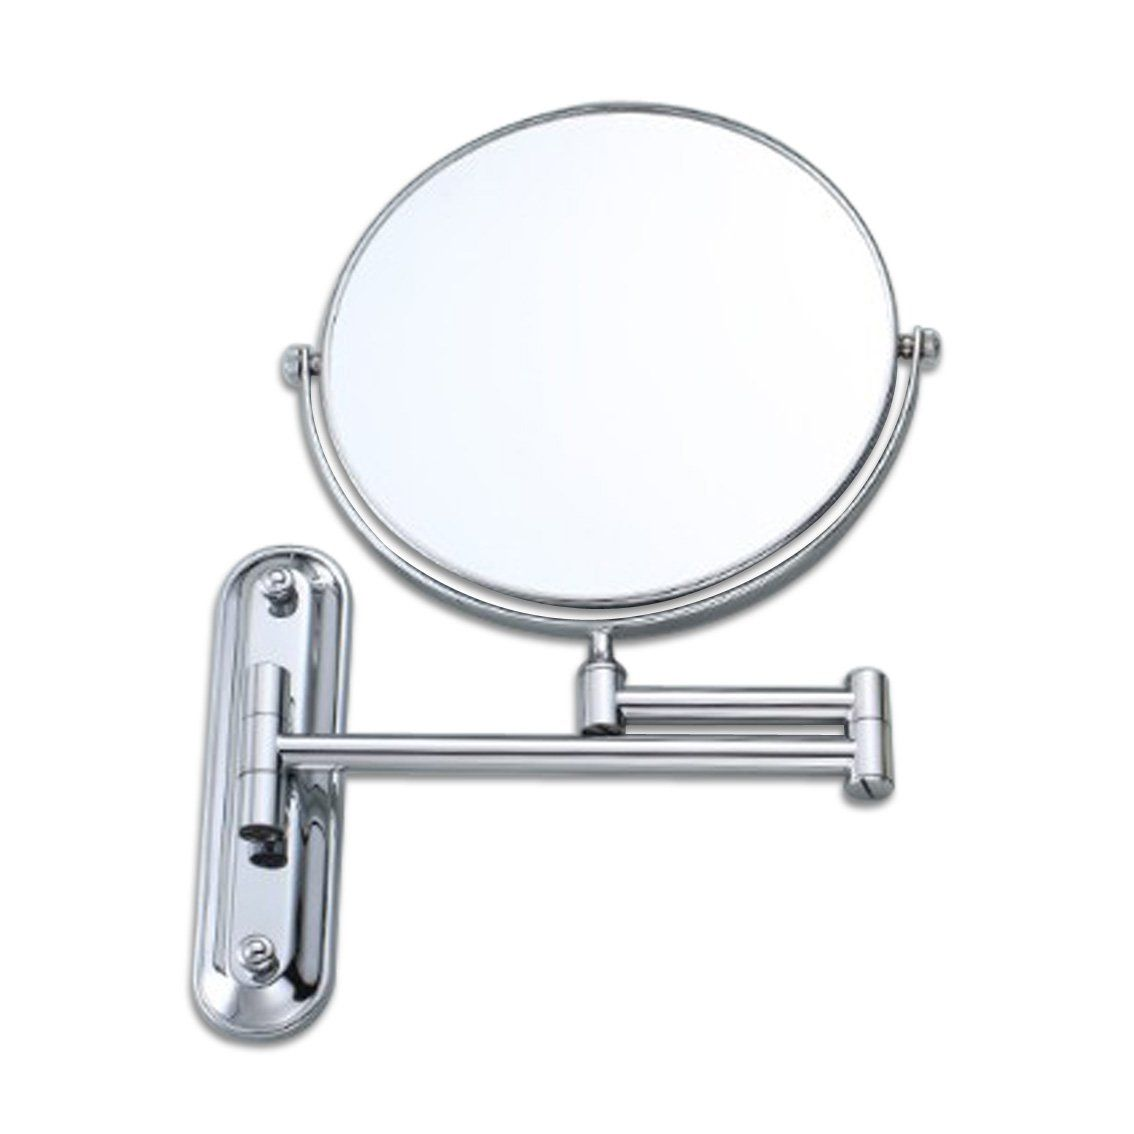 Siker Beauty Mirror Full Copper Wall Mounted Vanity Mirror